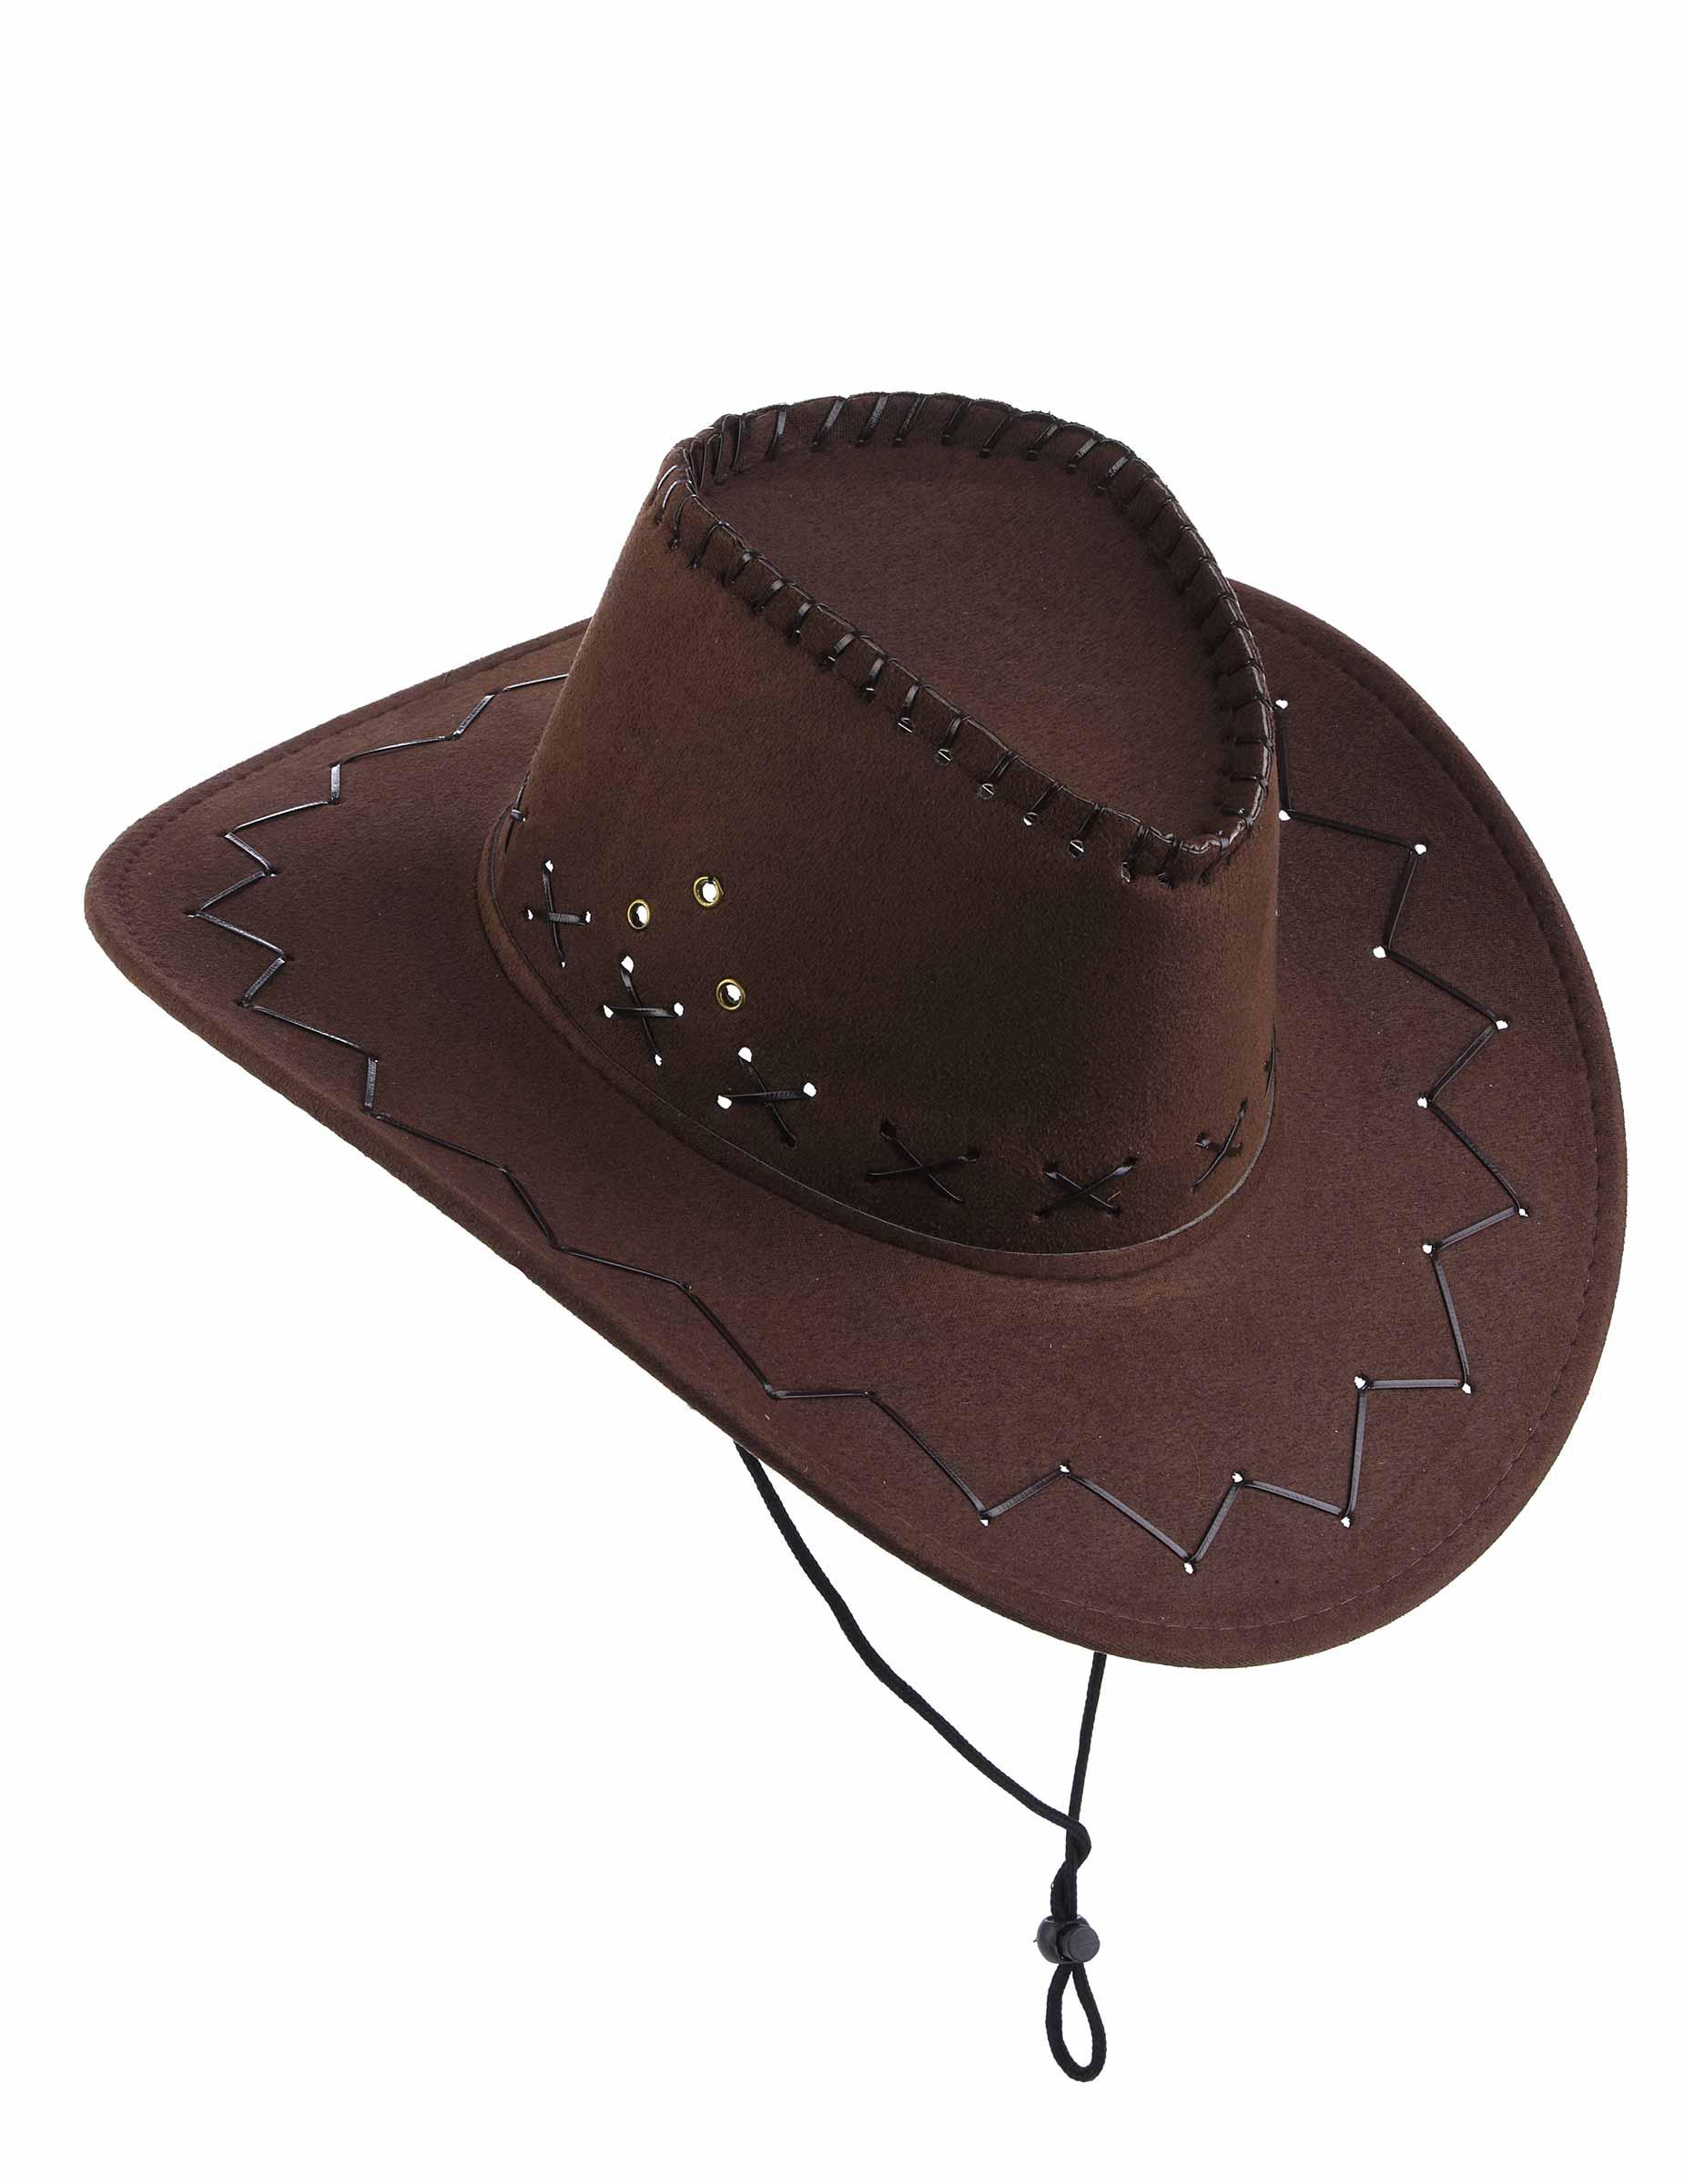 dc06a99c23159 chapéu cowboy marron efeito camurça - adulto  Chapéus